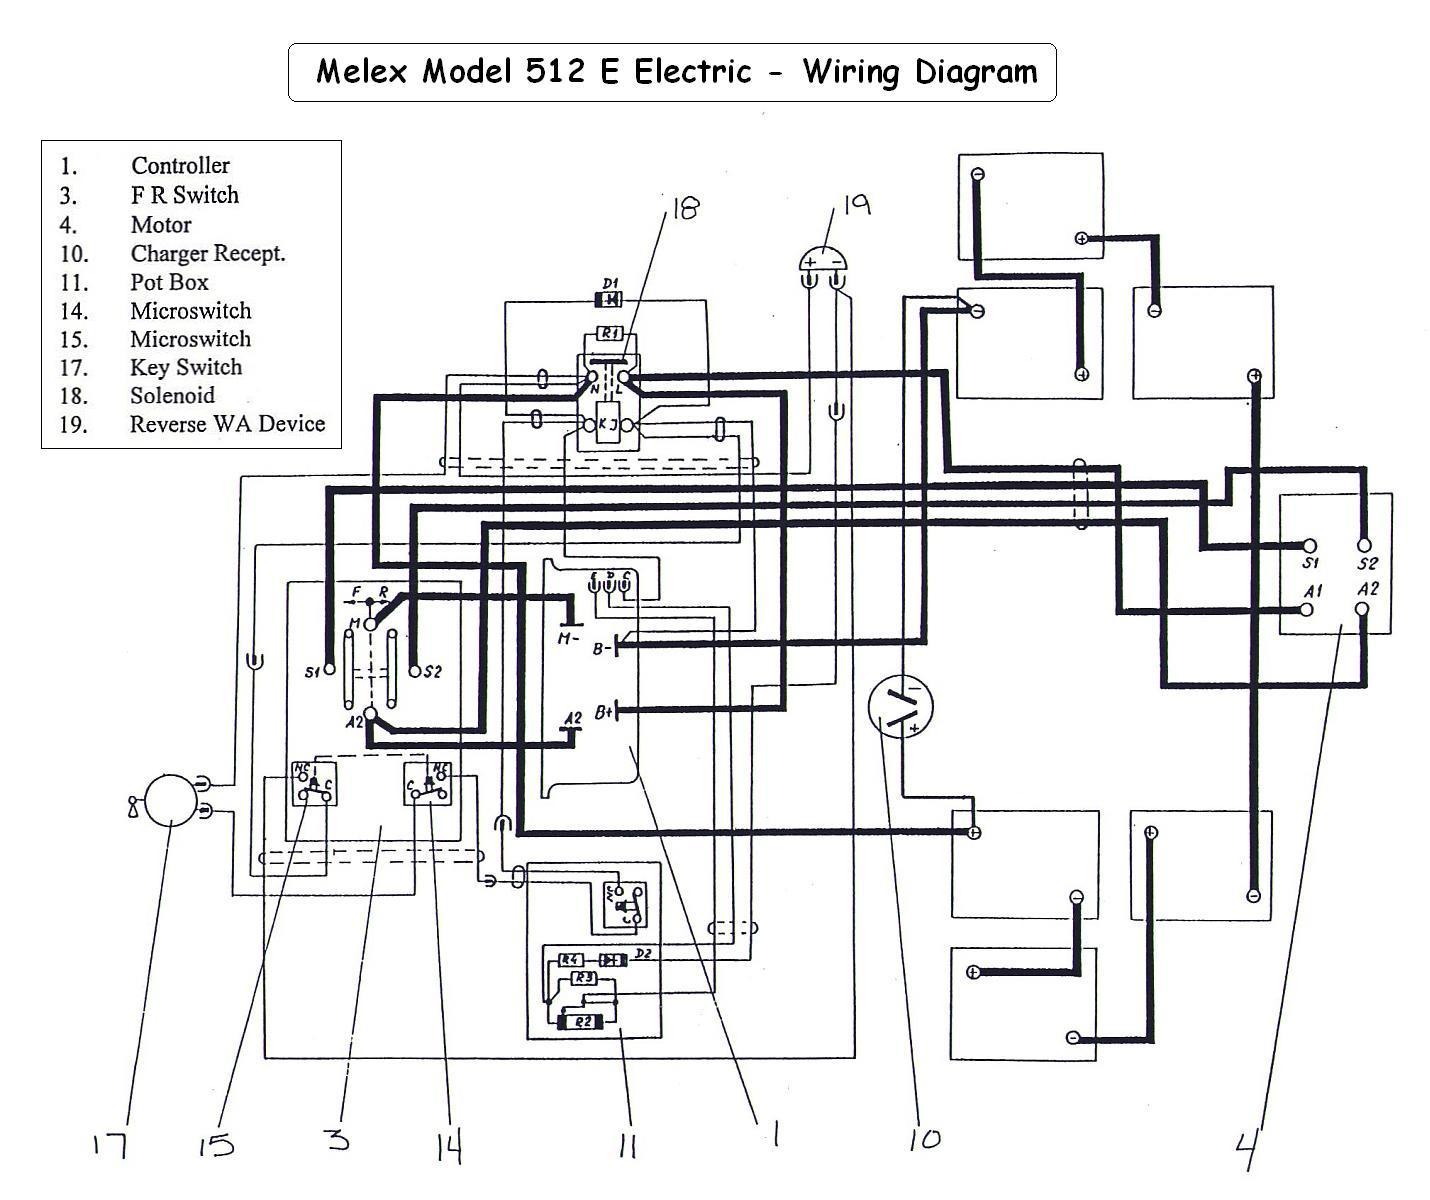 Scoreboard Control Wiring Diagram